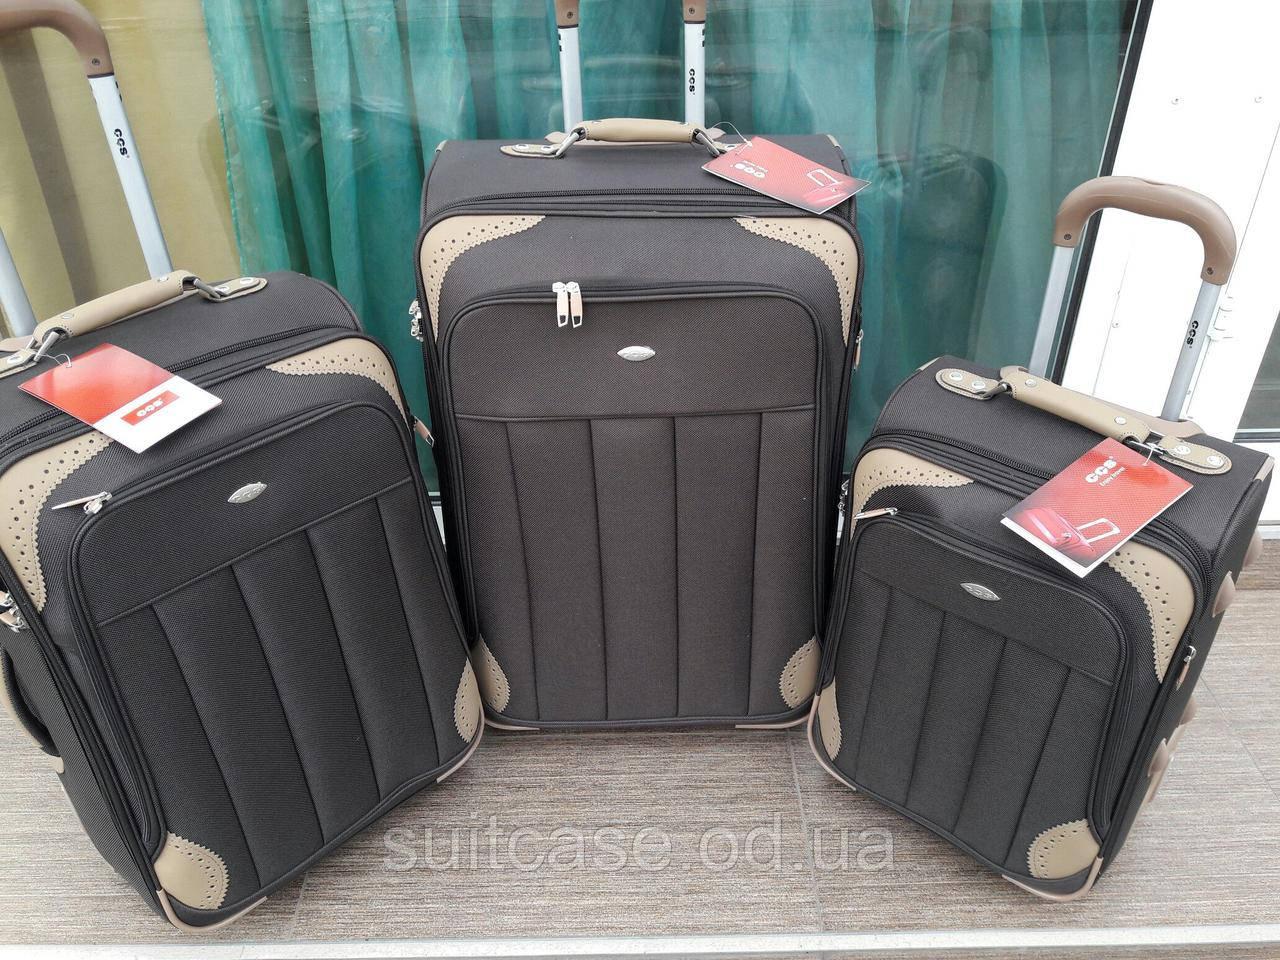 1653ac0aa42c Комплект чемоданов бизнес класса фирмы